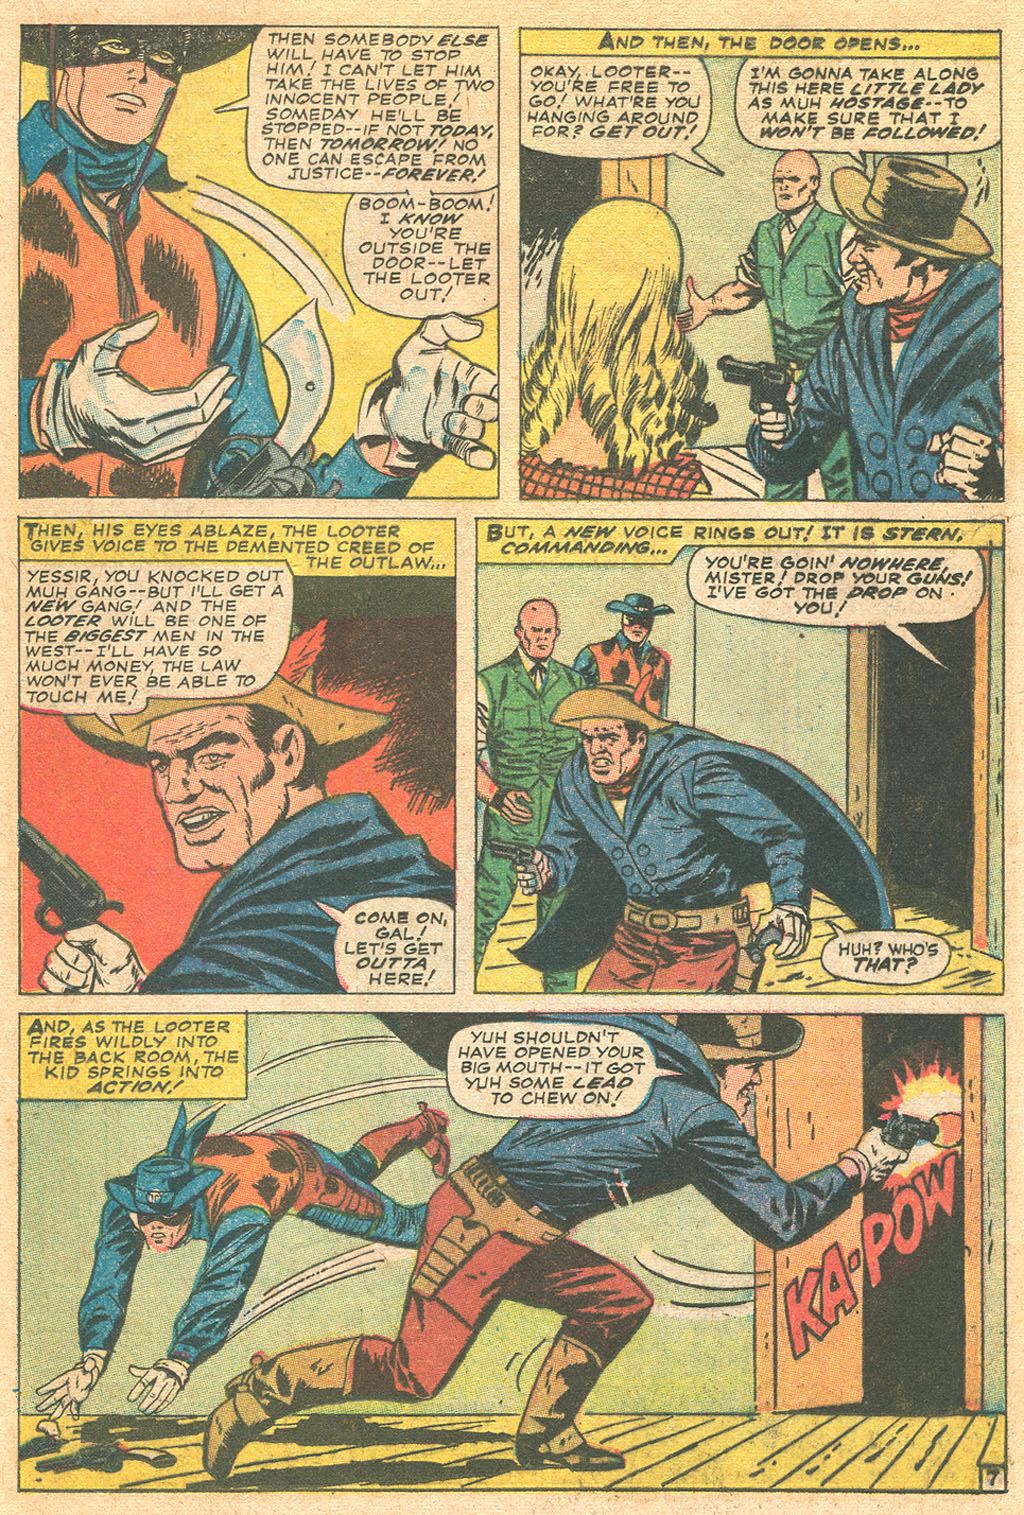 Read online Two-Gun Kid comic -  Issue #86 - 21